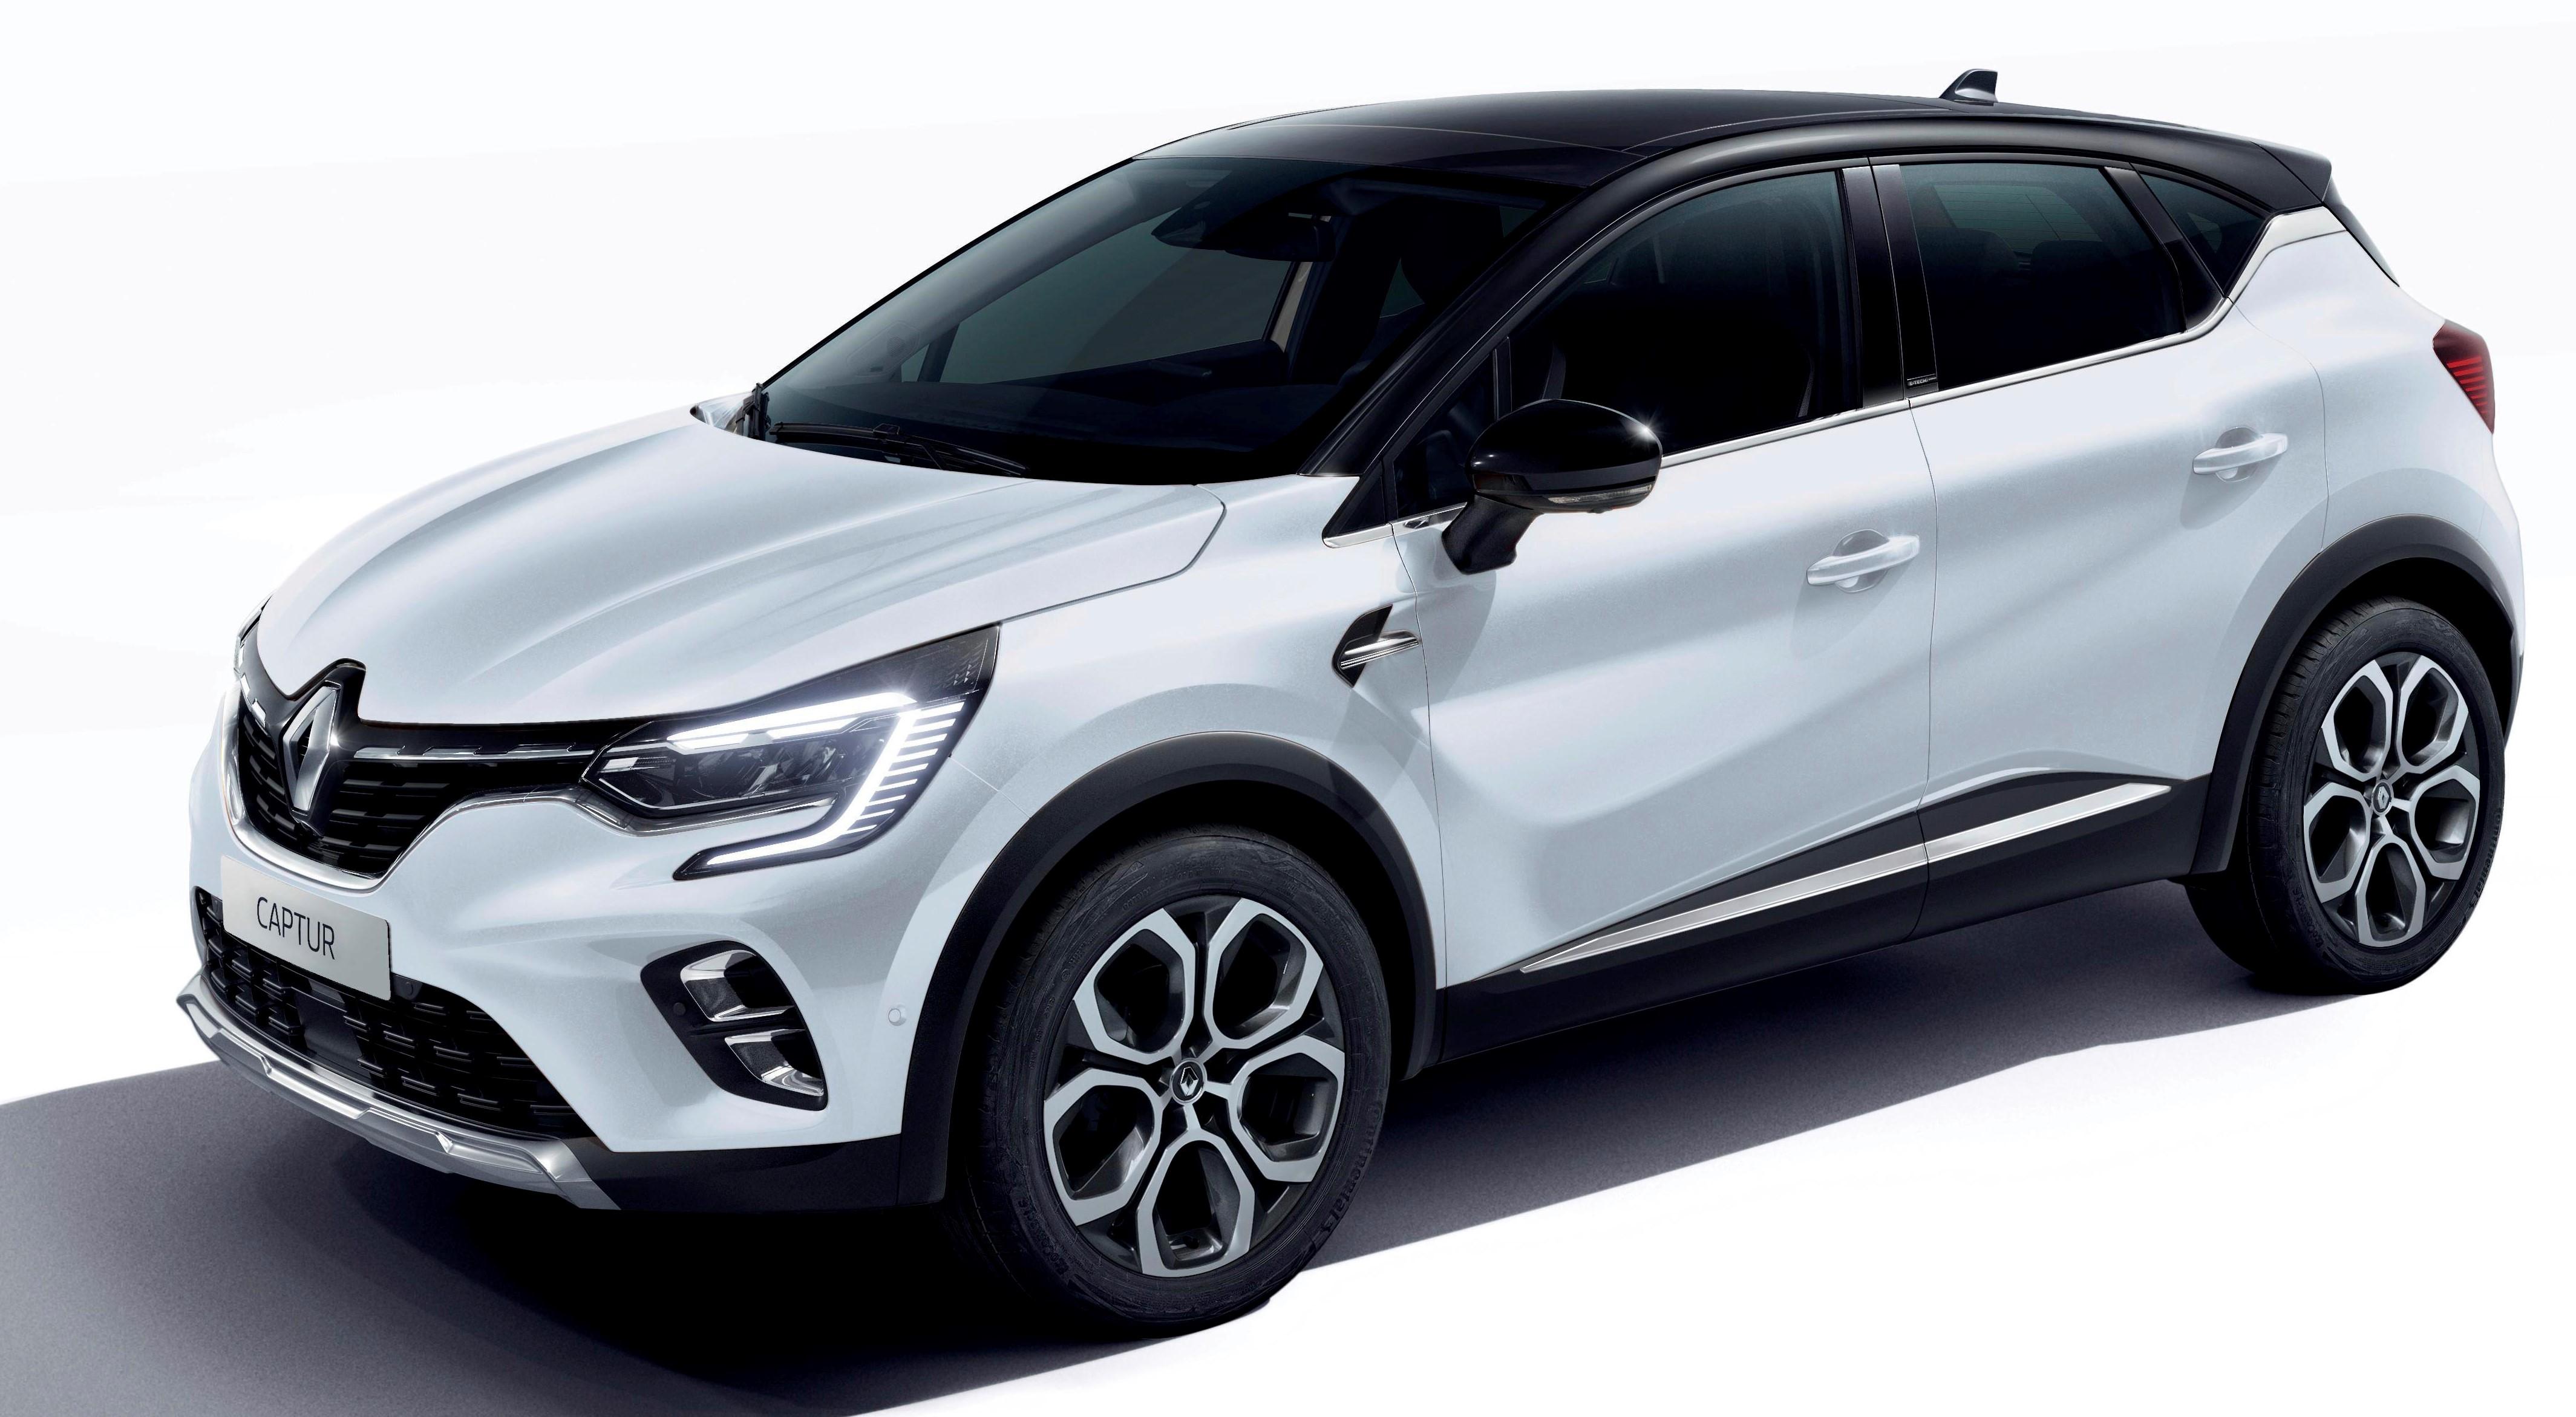 New Renault Captur E-Tech hybrid